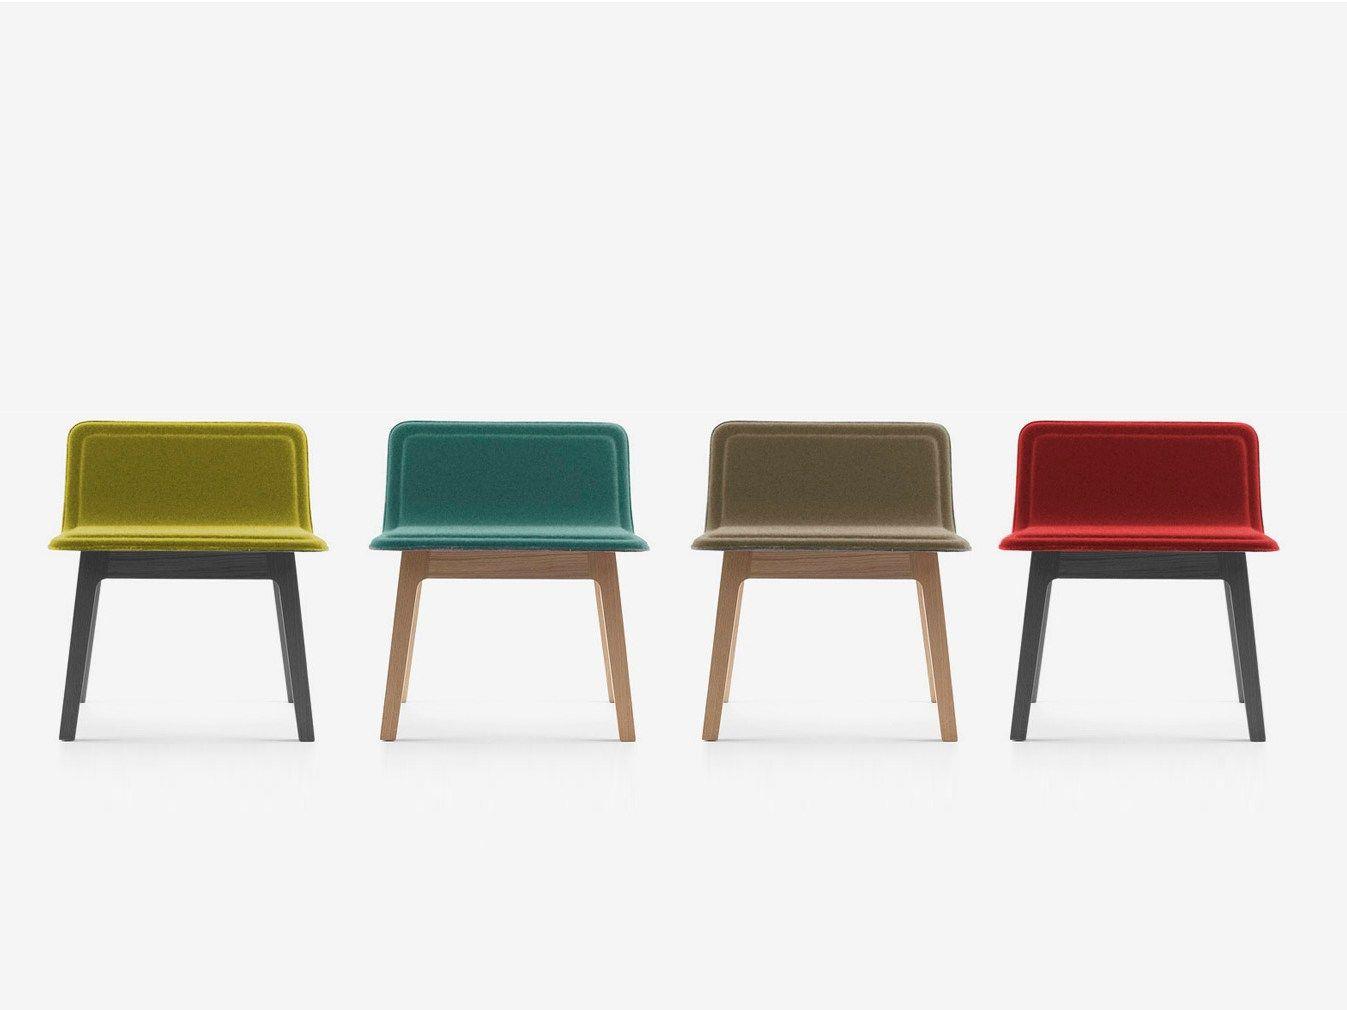 chaise en tissu laia lounge collection laia by alki design jean louis iratzok. Black Bedroom Furniture Sets. Home Design Ideas